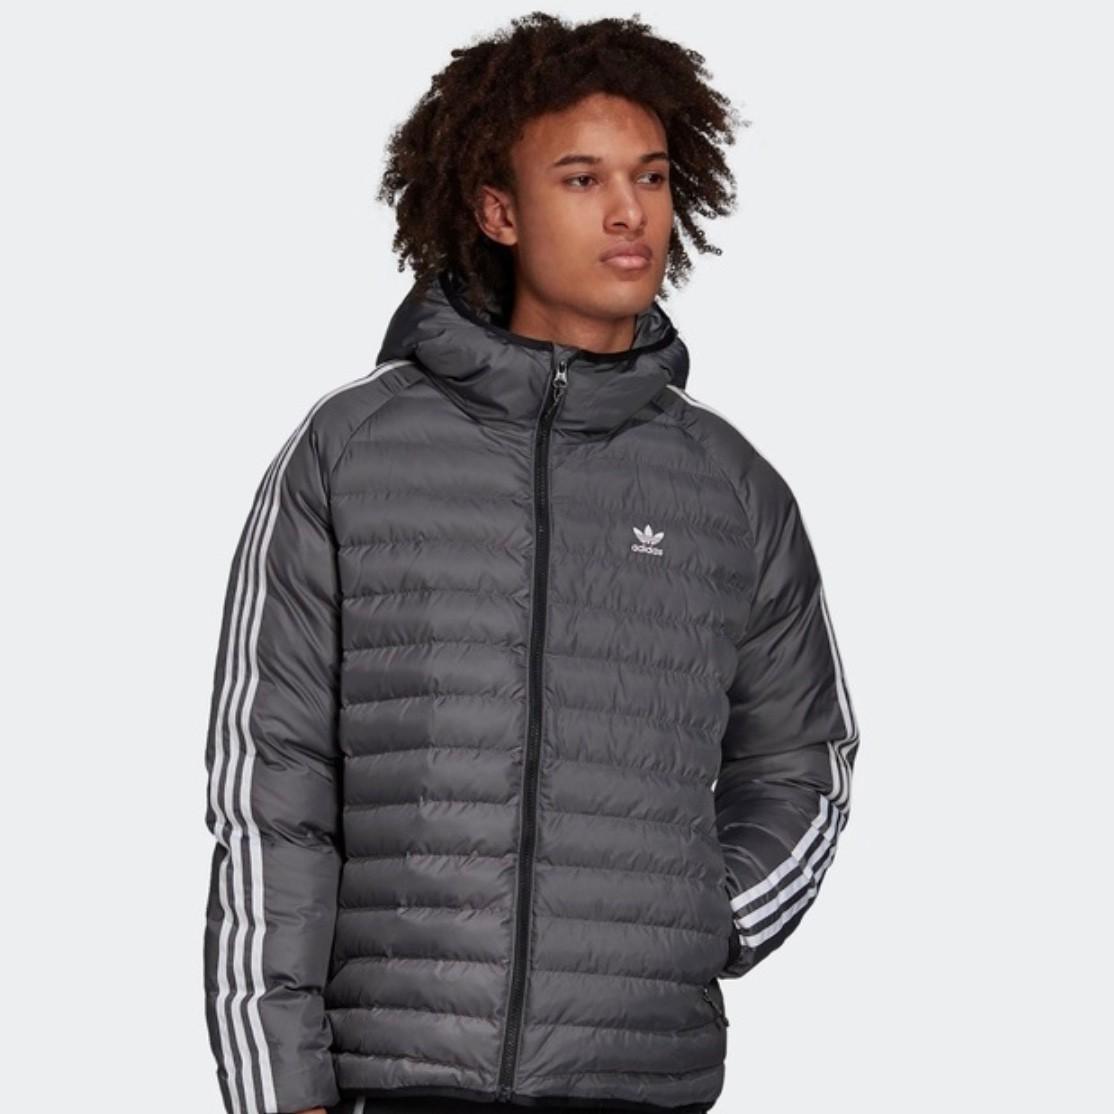 adidas 阿迪达斯 ADICOLOR JACKET BAFFLE FN0929 男款运动夹棉外套